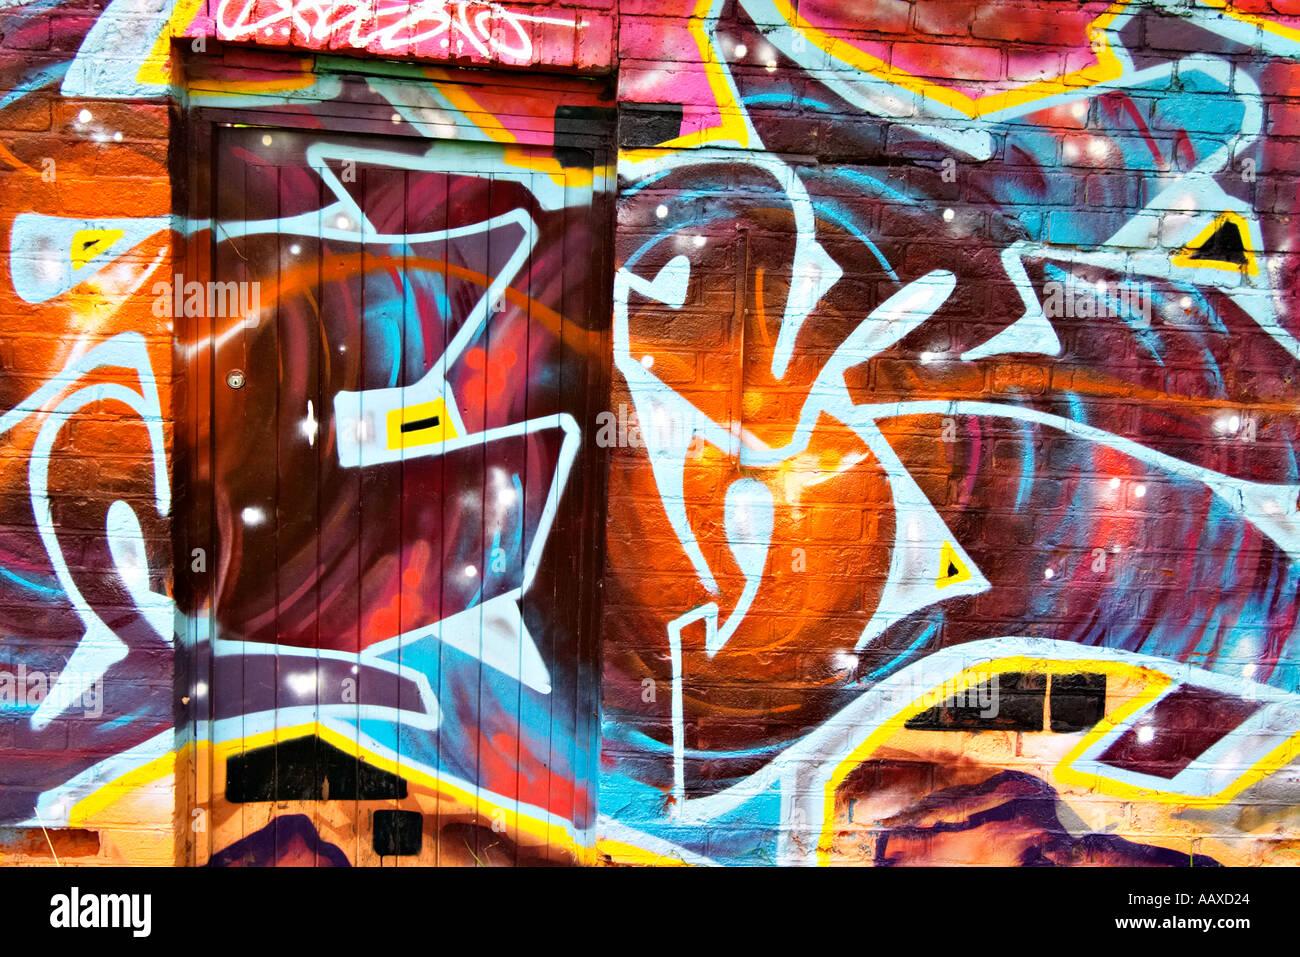 graffiti graffitti grafiti grafitti door wall brick art spray can modern urban tag tagging color colourful vandalsim youth cultu - Stock Image